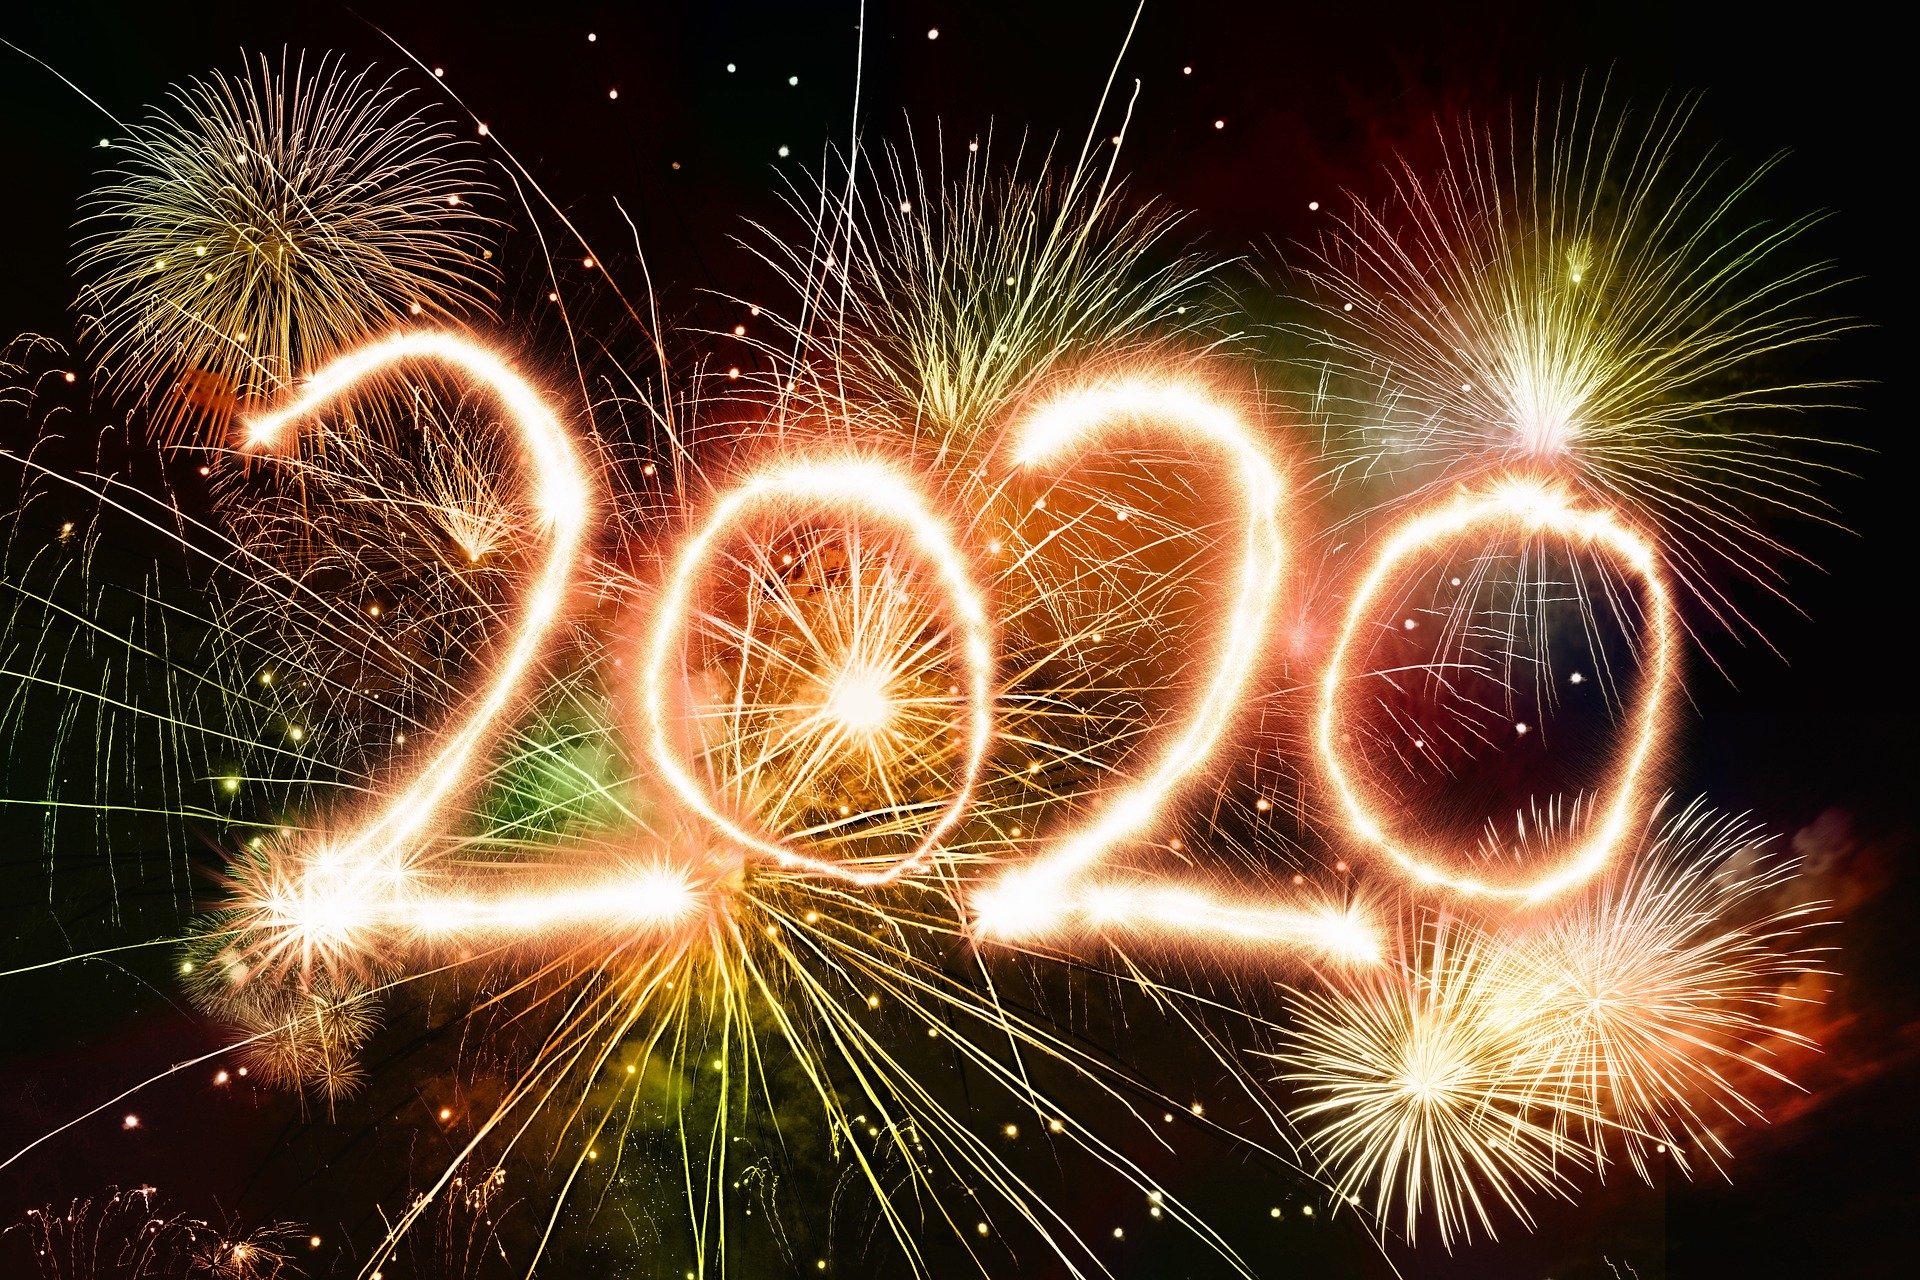 Fireworks 3940446 1920